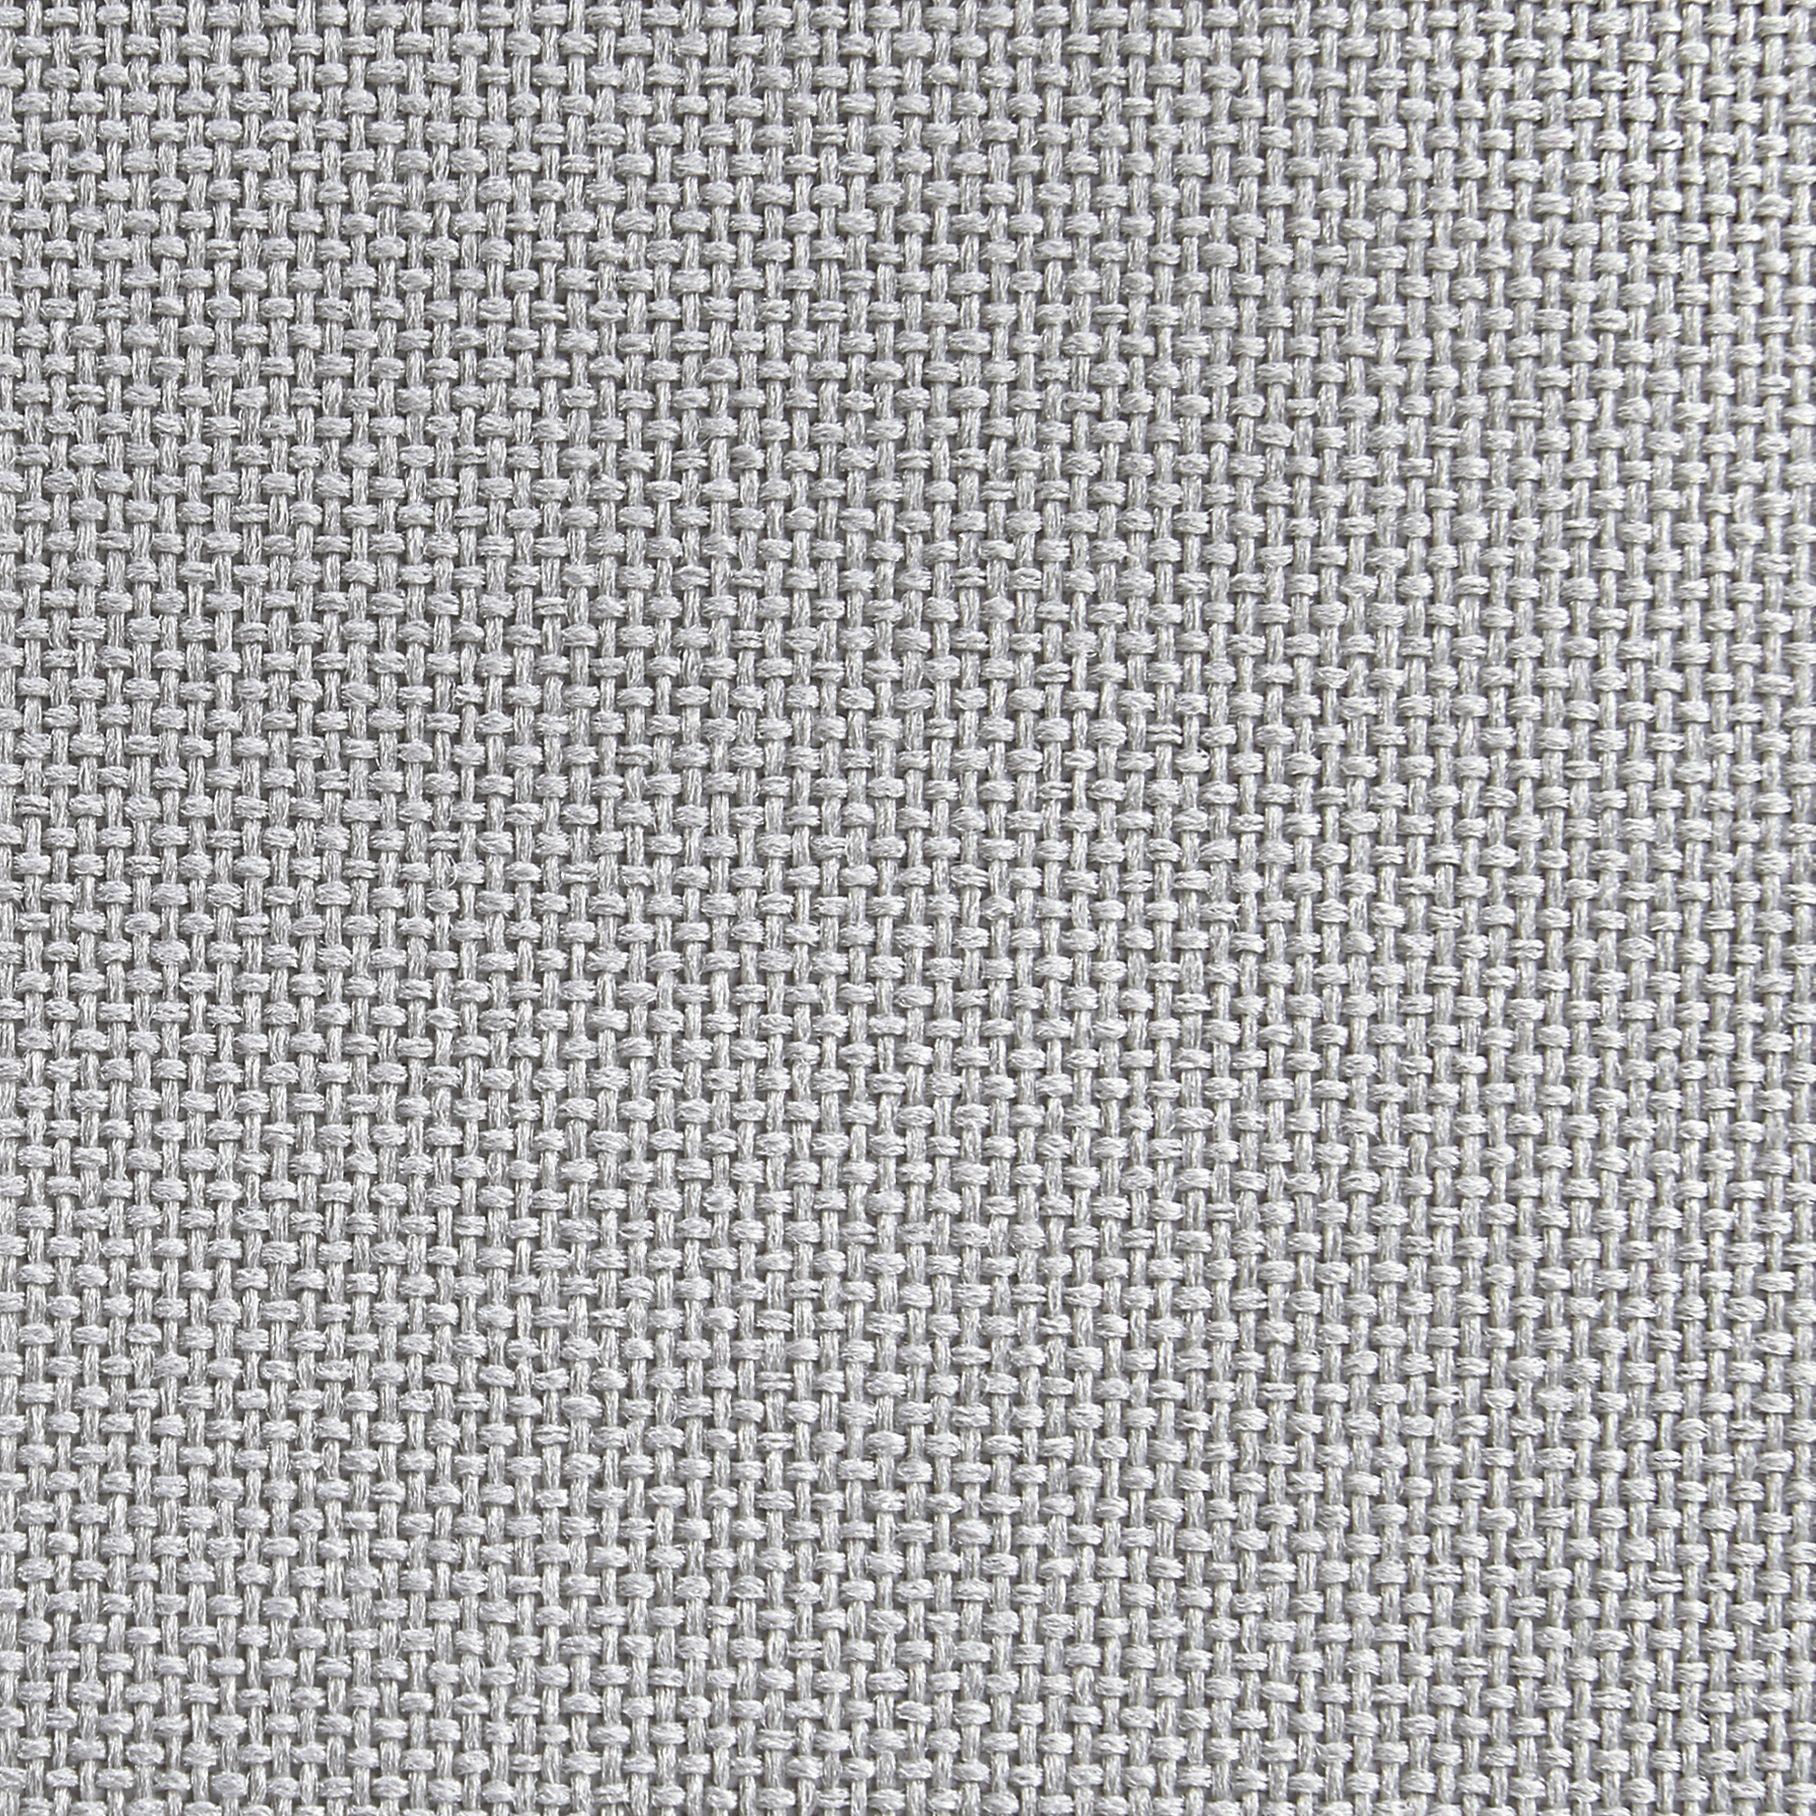 Outdoorsitzsack Kerim - Hellgrau, Textil (66/66/58cm) - MÖMAX modern living